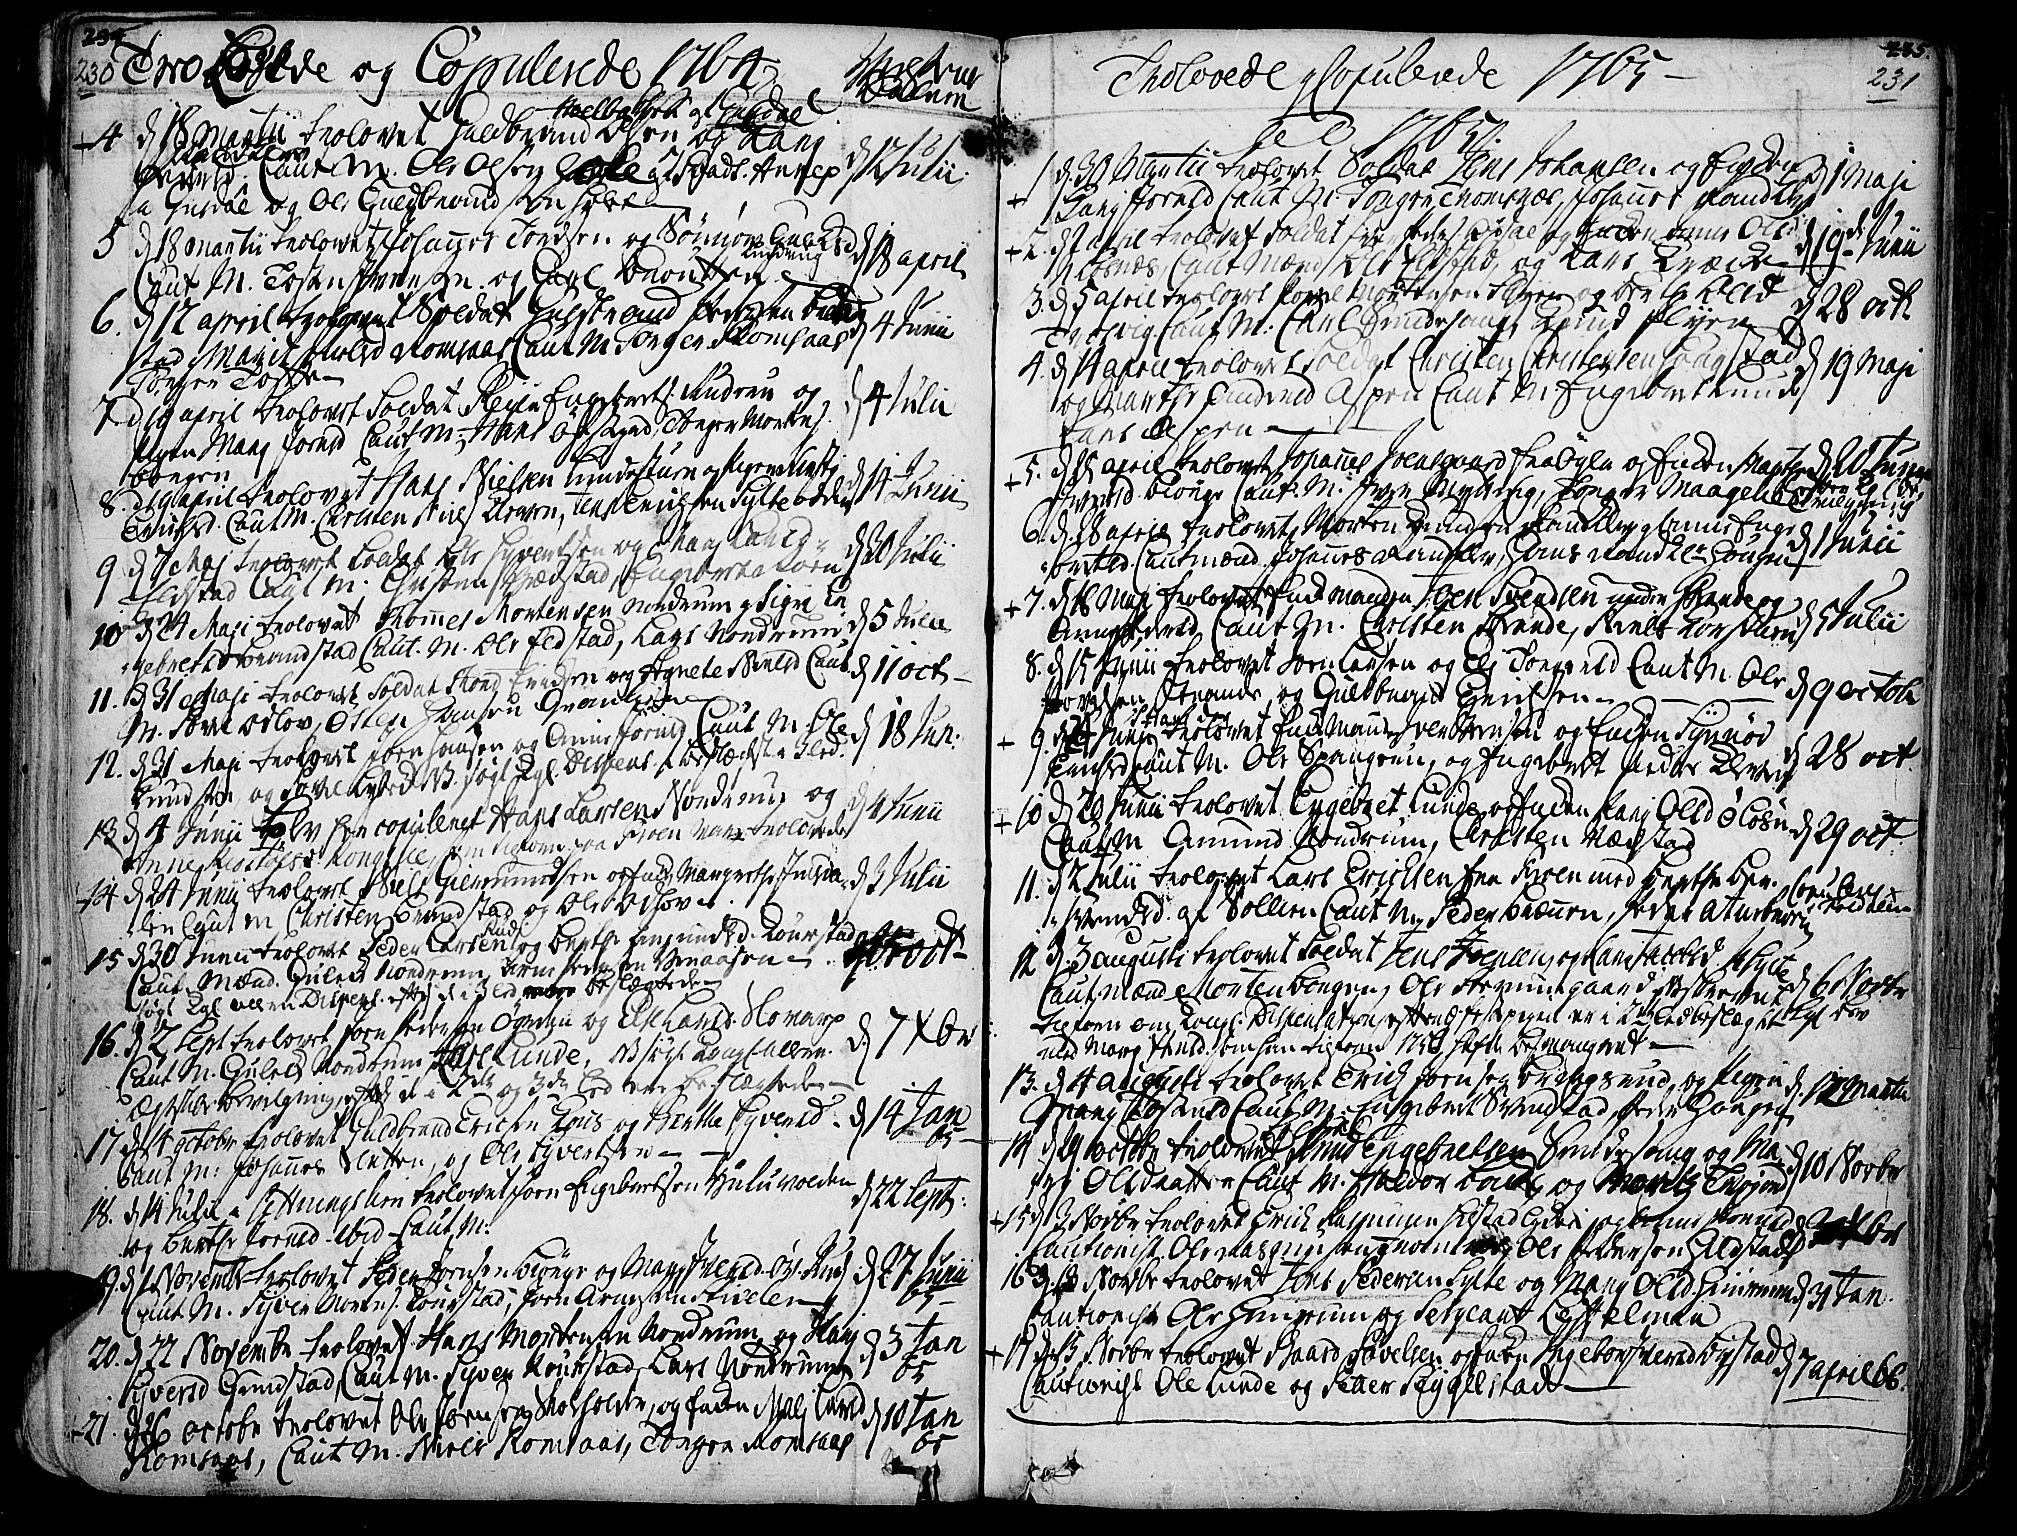 SAH, Ringebu prestekontor, Ministerialbok nr. 2, 1734-1780, s. 230-231